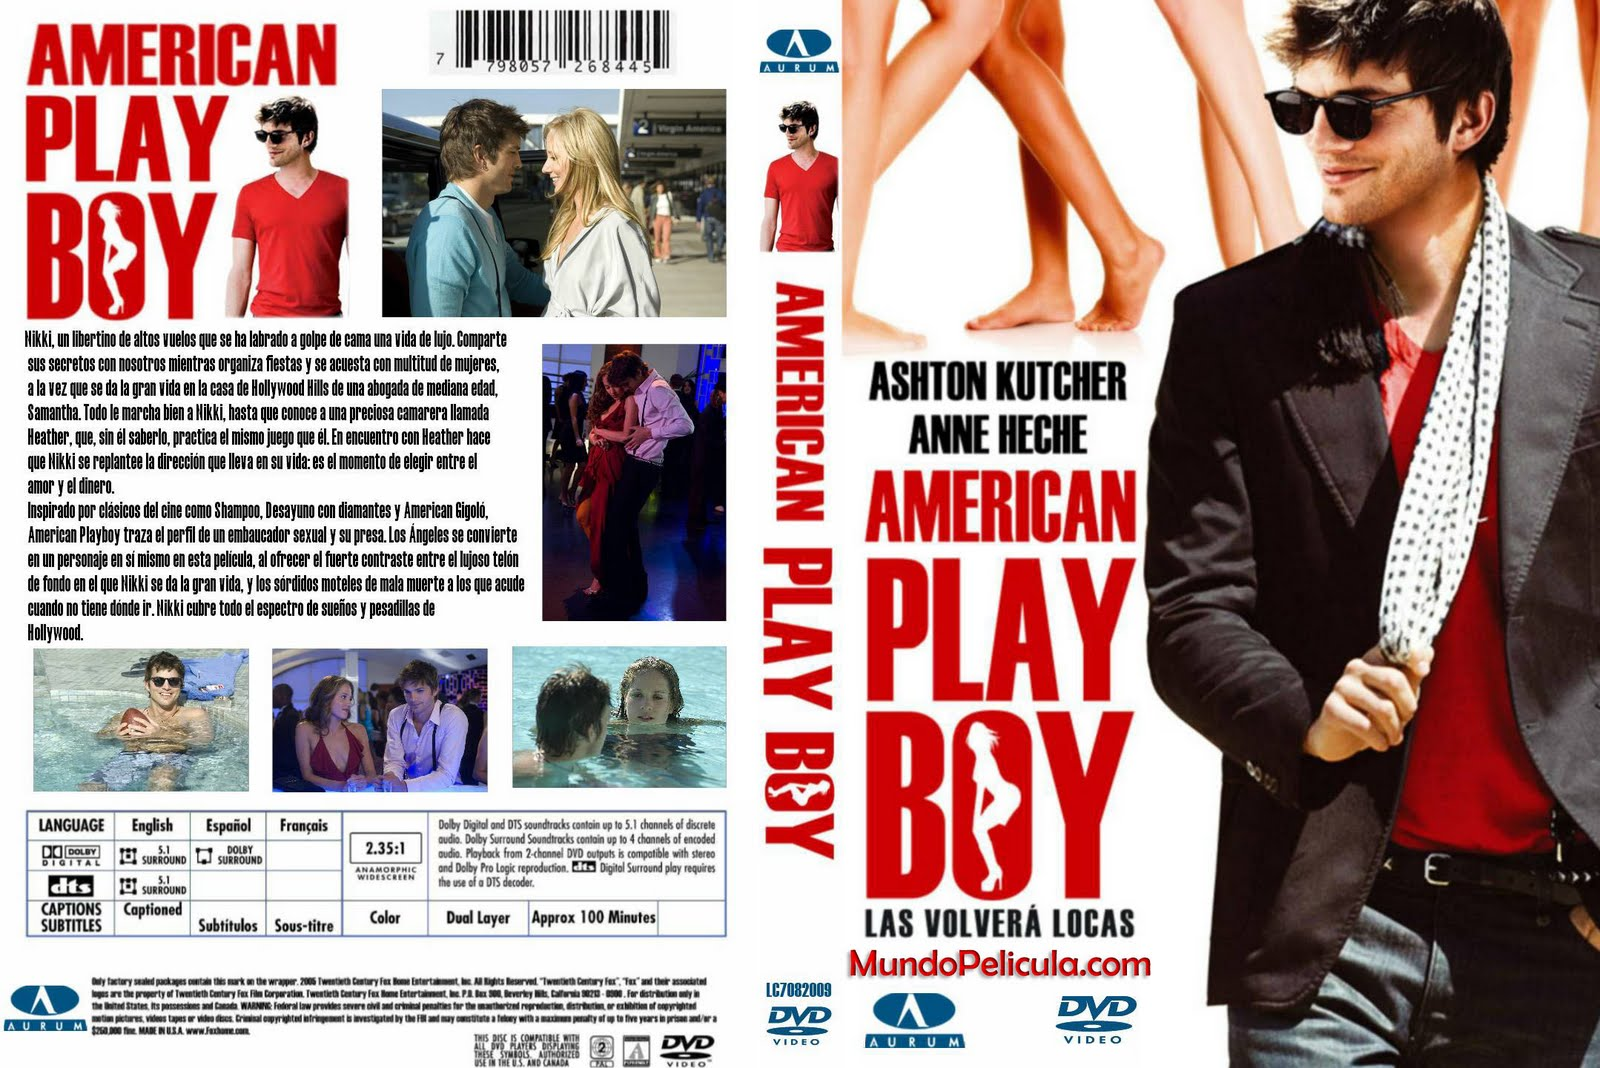 http://4.bp.blogspot.com/_oX5-W-SruQM/SwuN6rnsuaI/AAAAAAAAAxc/pBOl-7MCaXs/S1600-R/American_Playboy-%28MundoPelicula.com%29.jpg